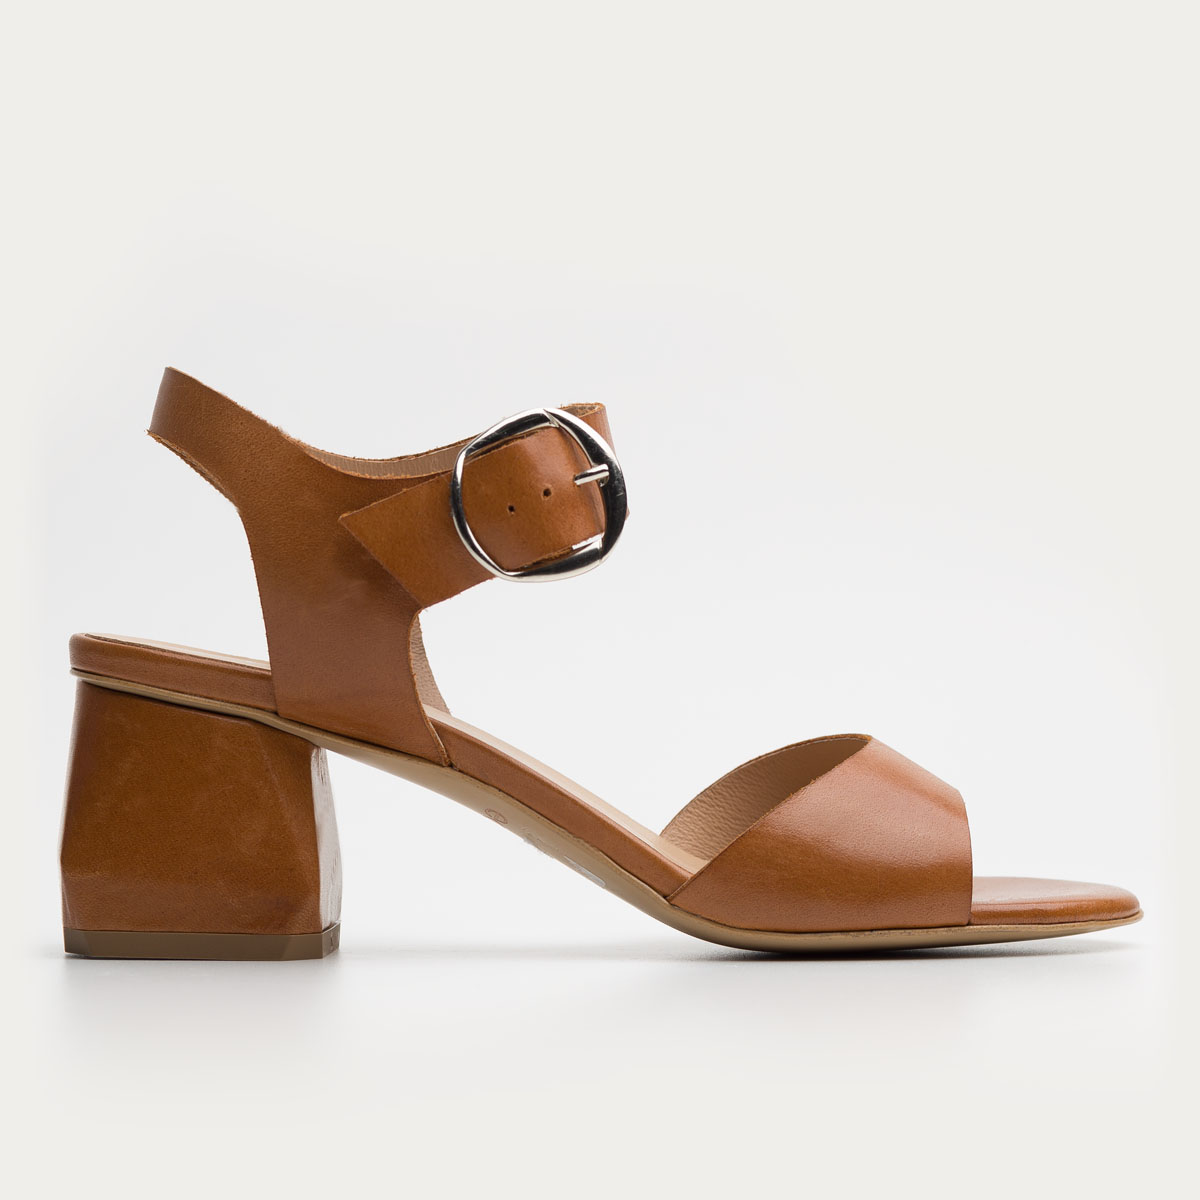 Rude licowe sandały na klocku